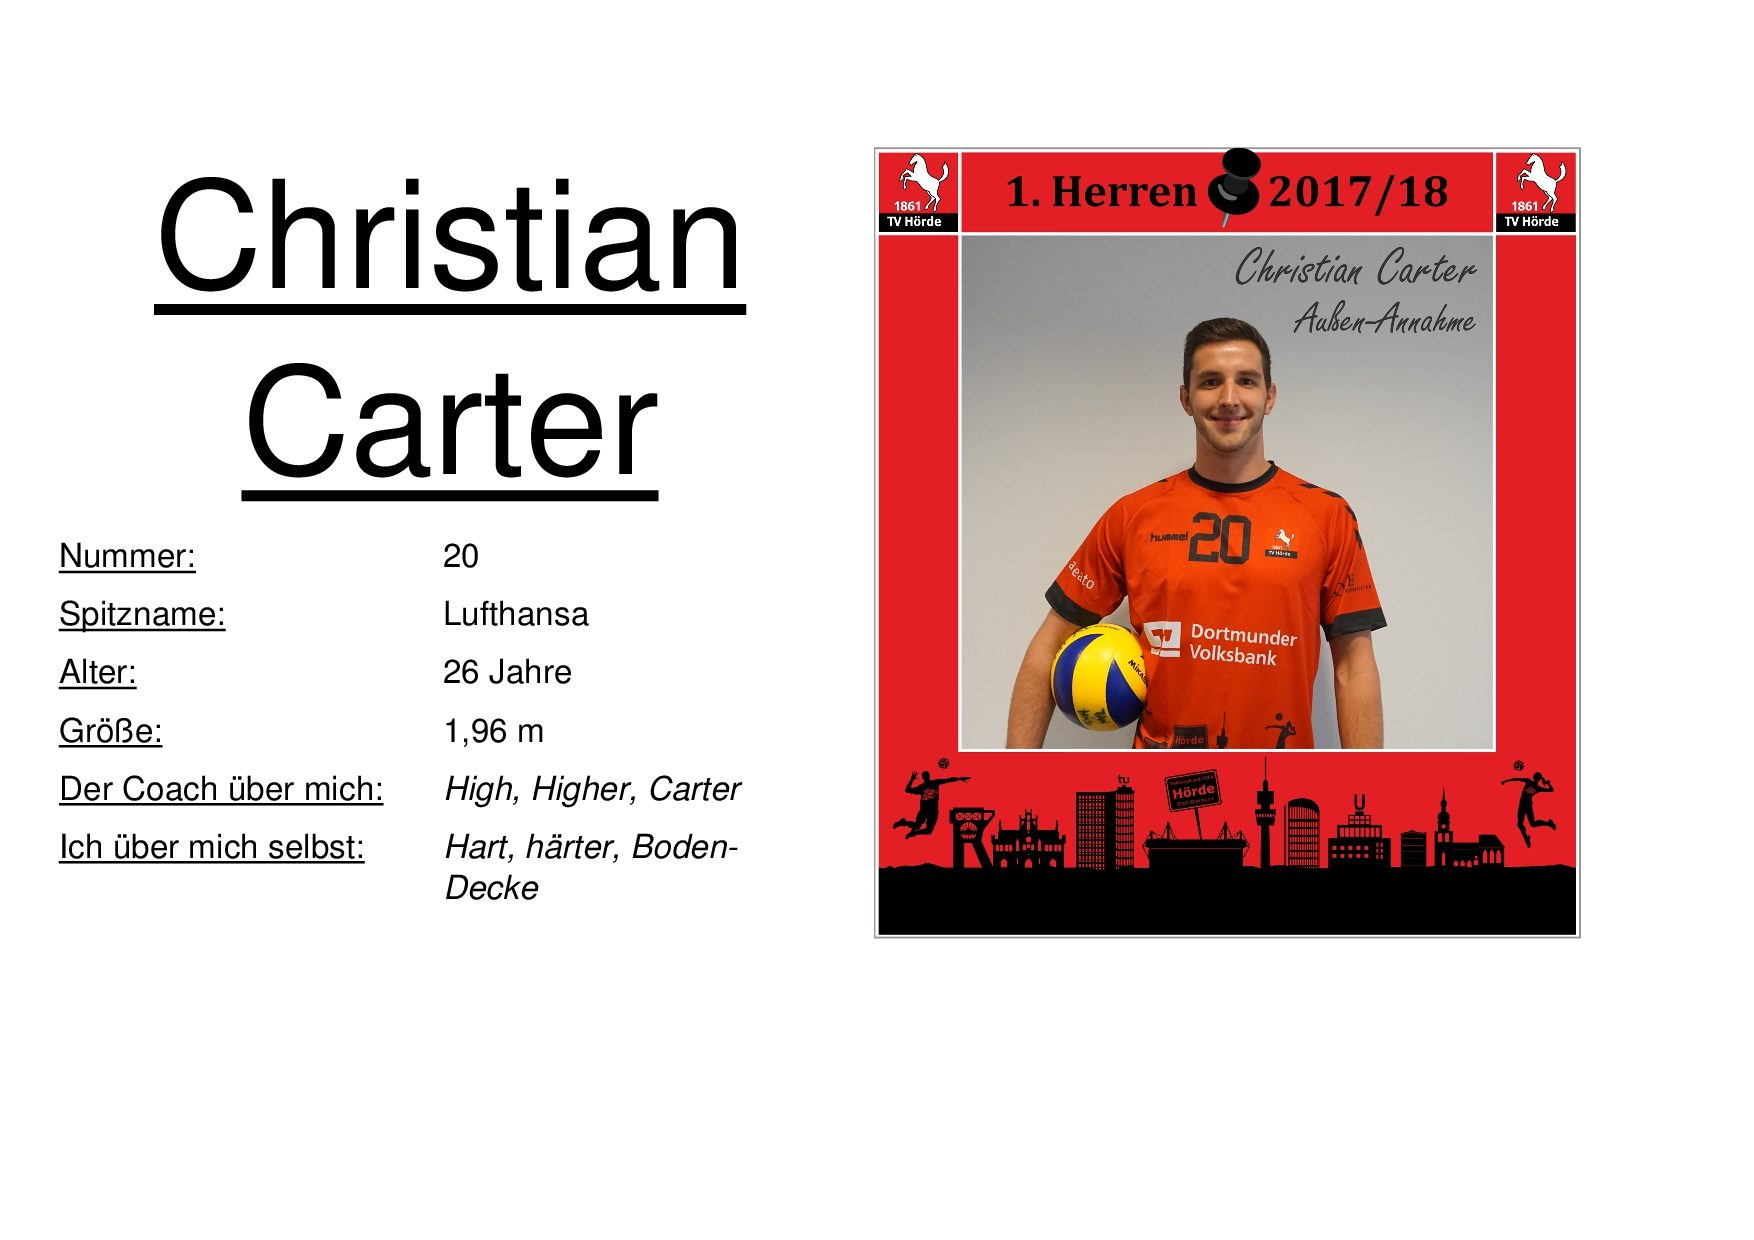 Christian Carter